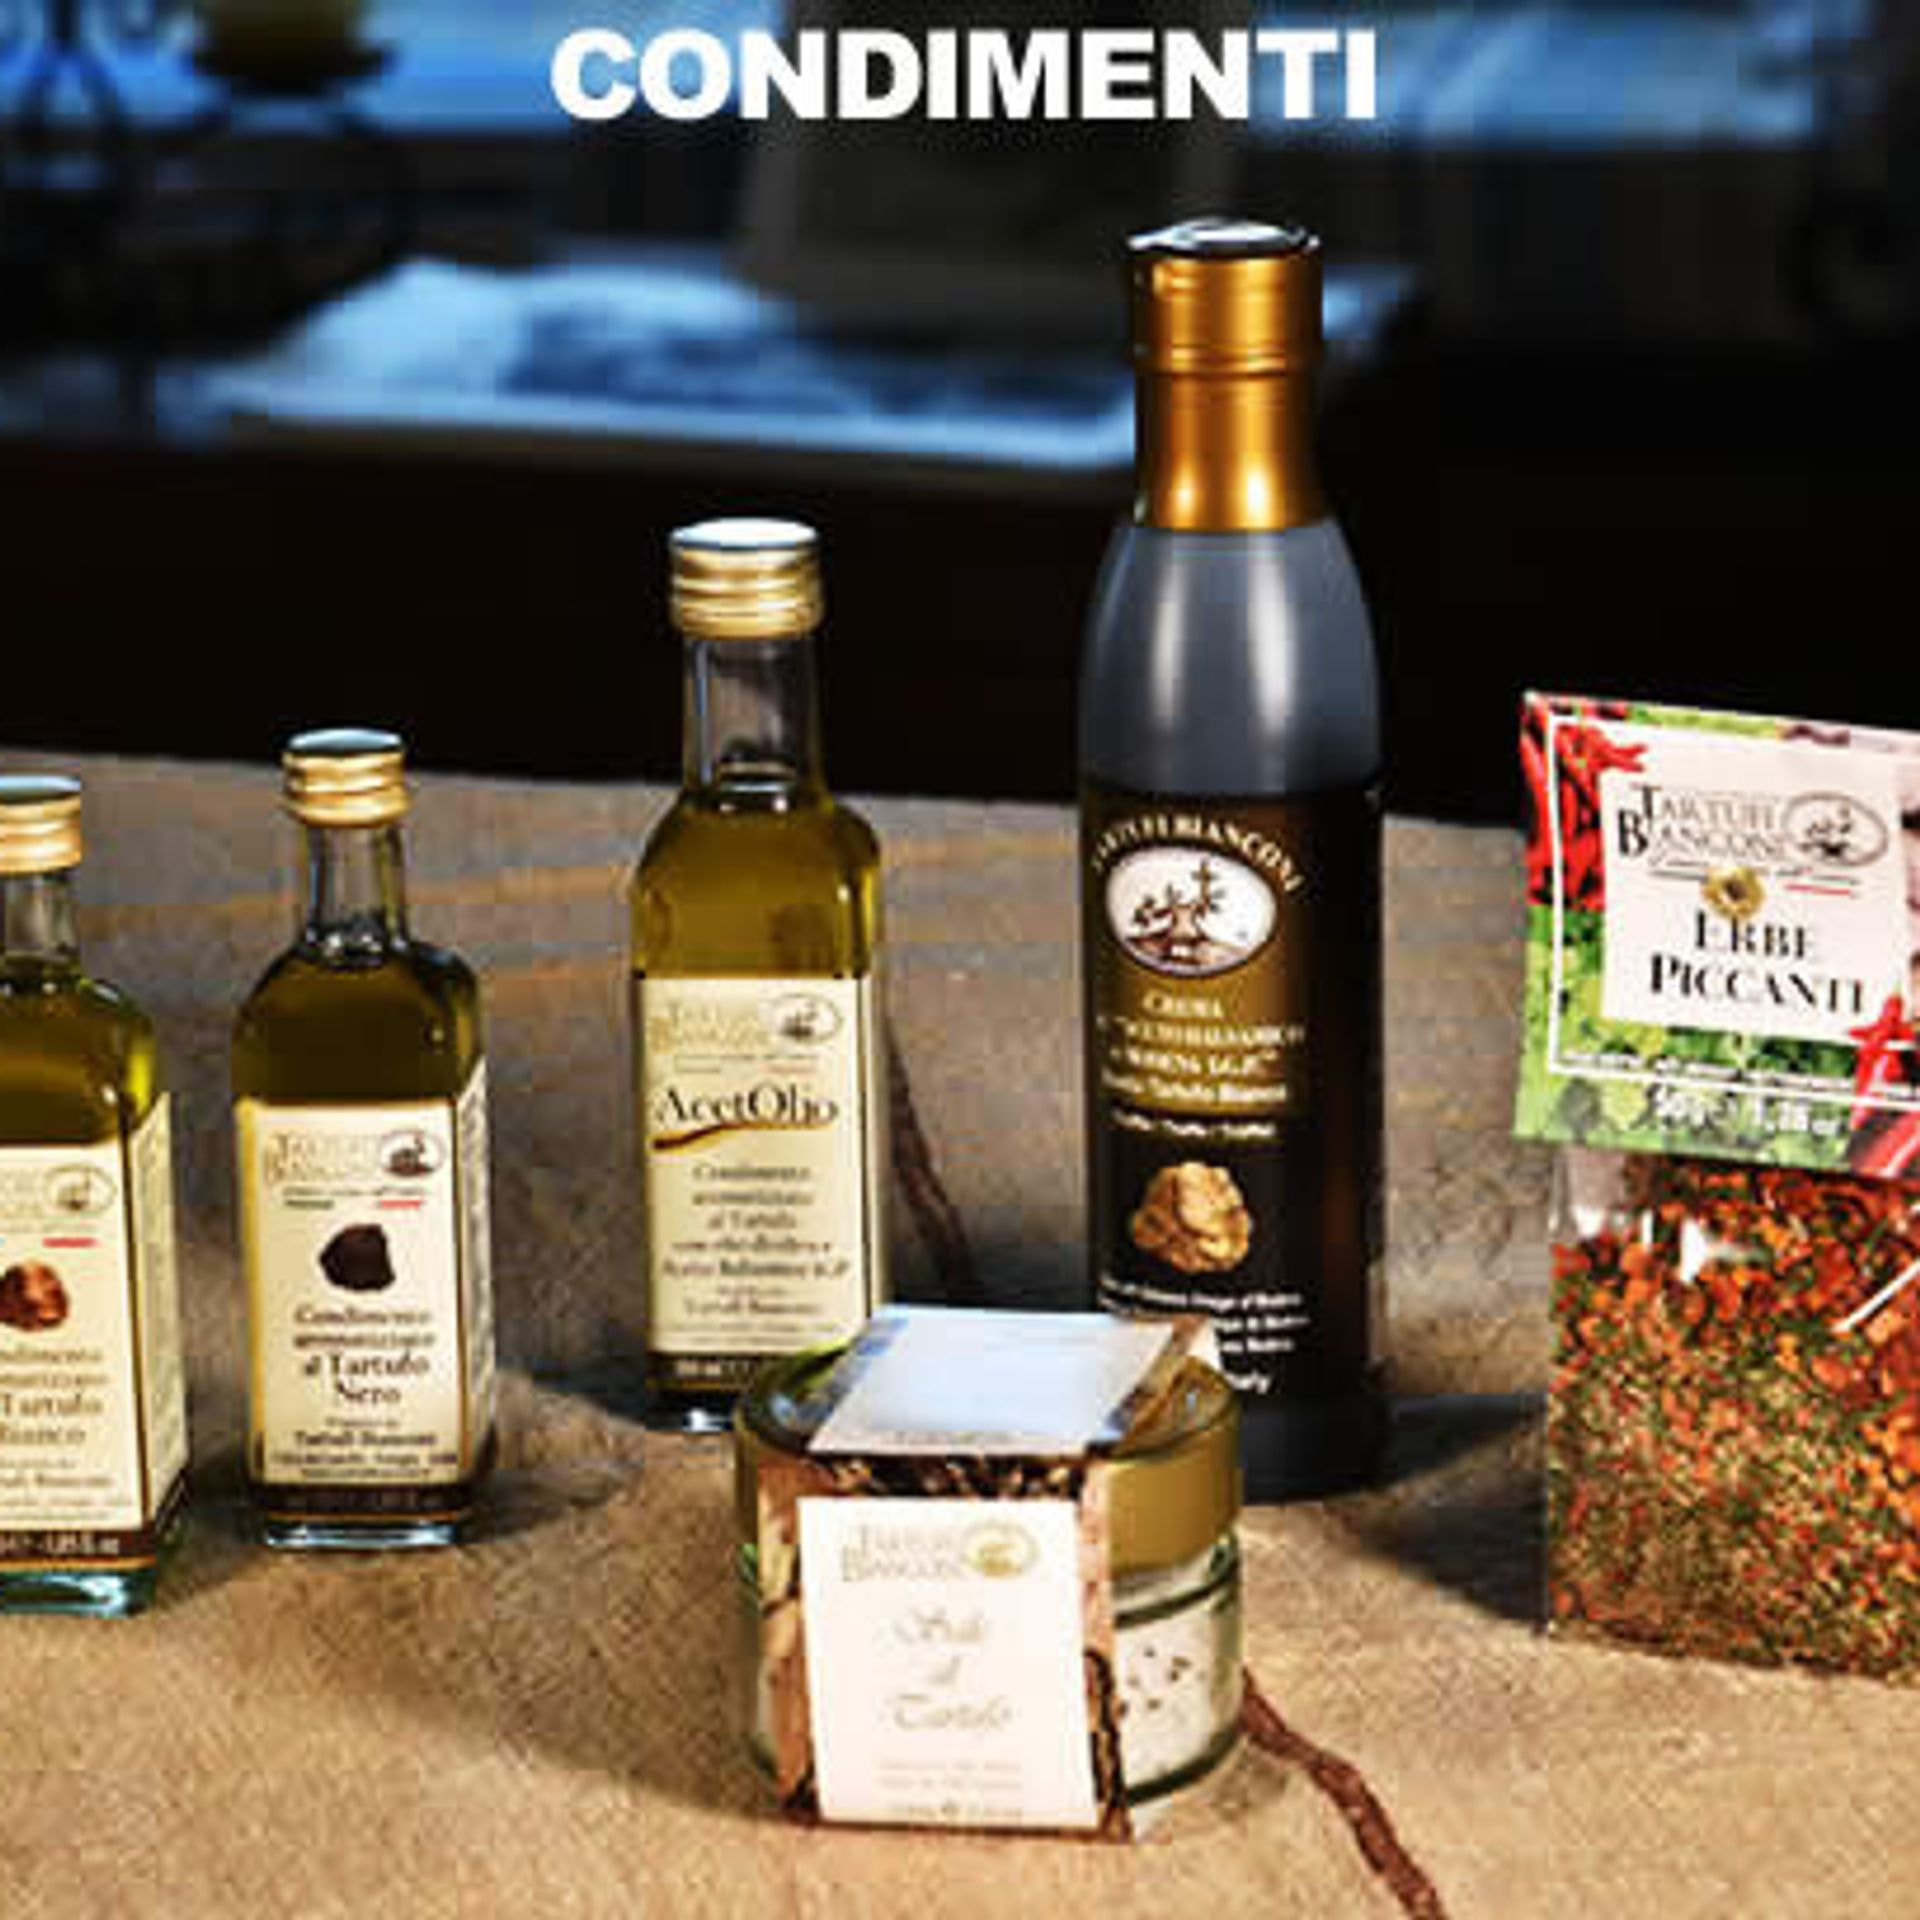 condimenti, sale, olio, spezie,tartufi bianconi